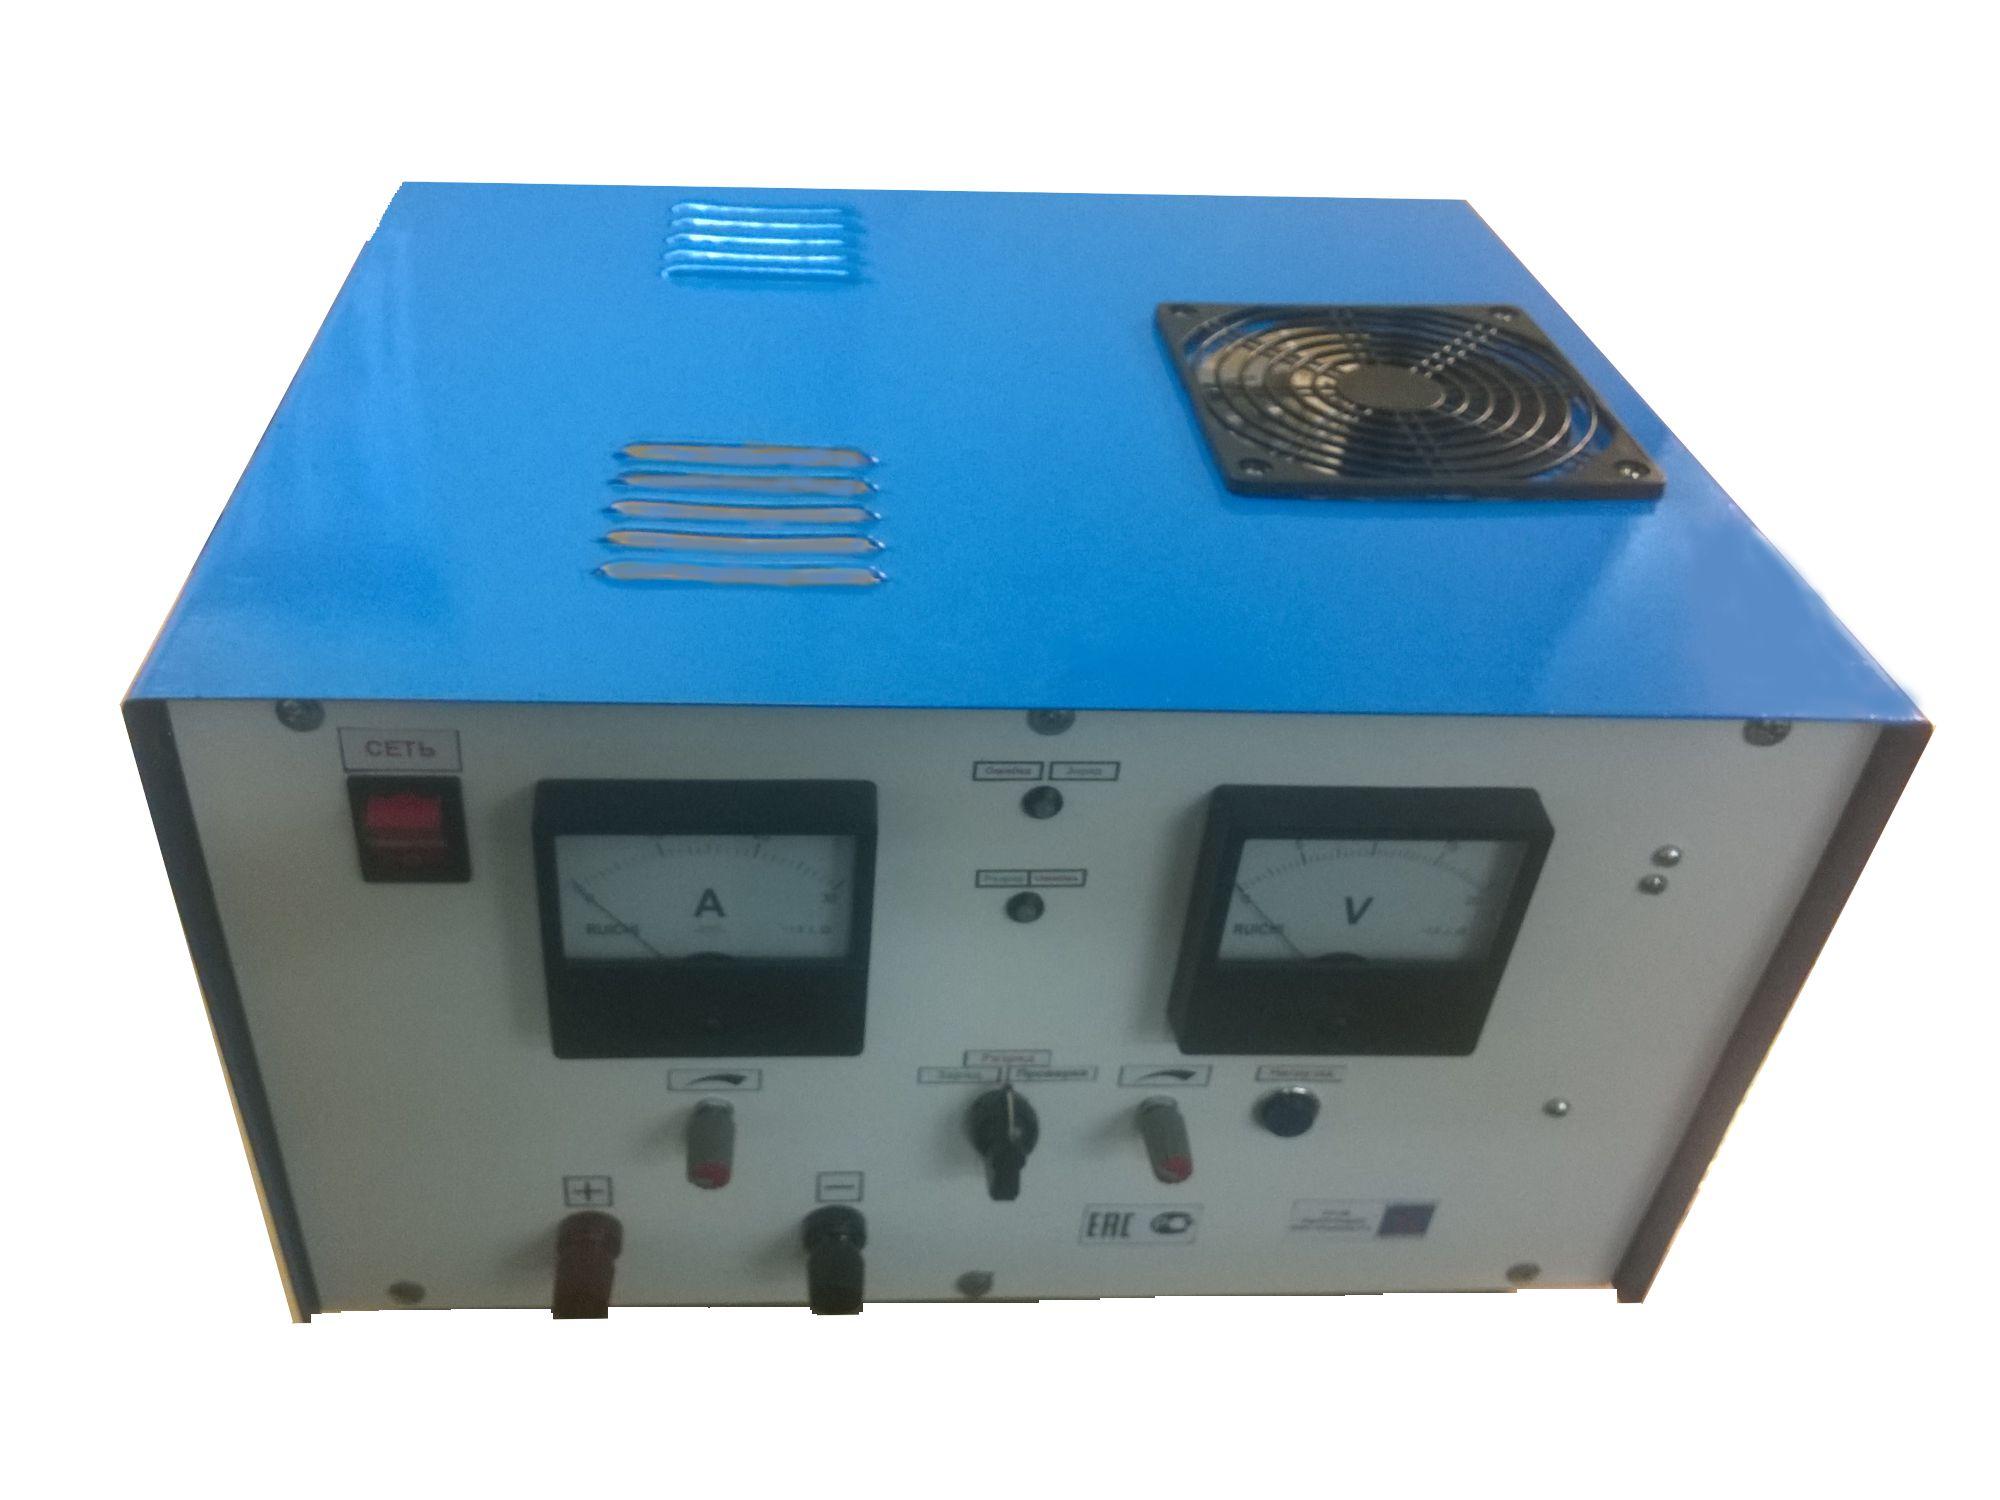 схема универсального зарядного устройства зу-1вм